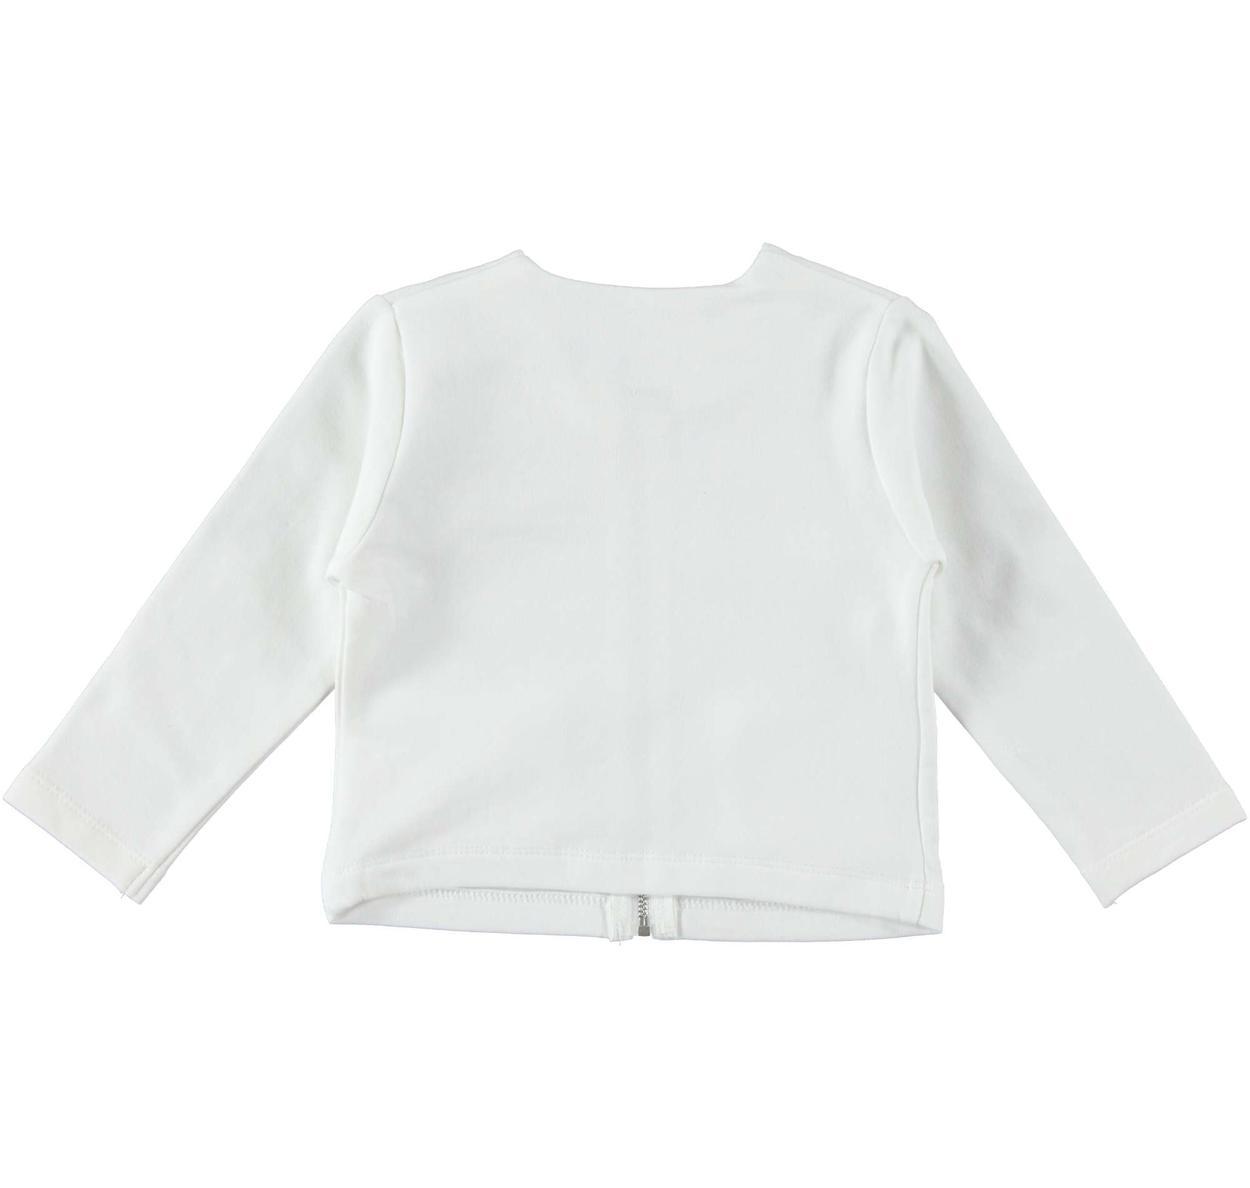 Giacchina in felpa di cotone con fiori lurex per bambina da 6 a 36 mesi iDO